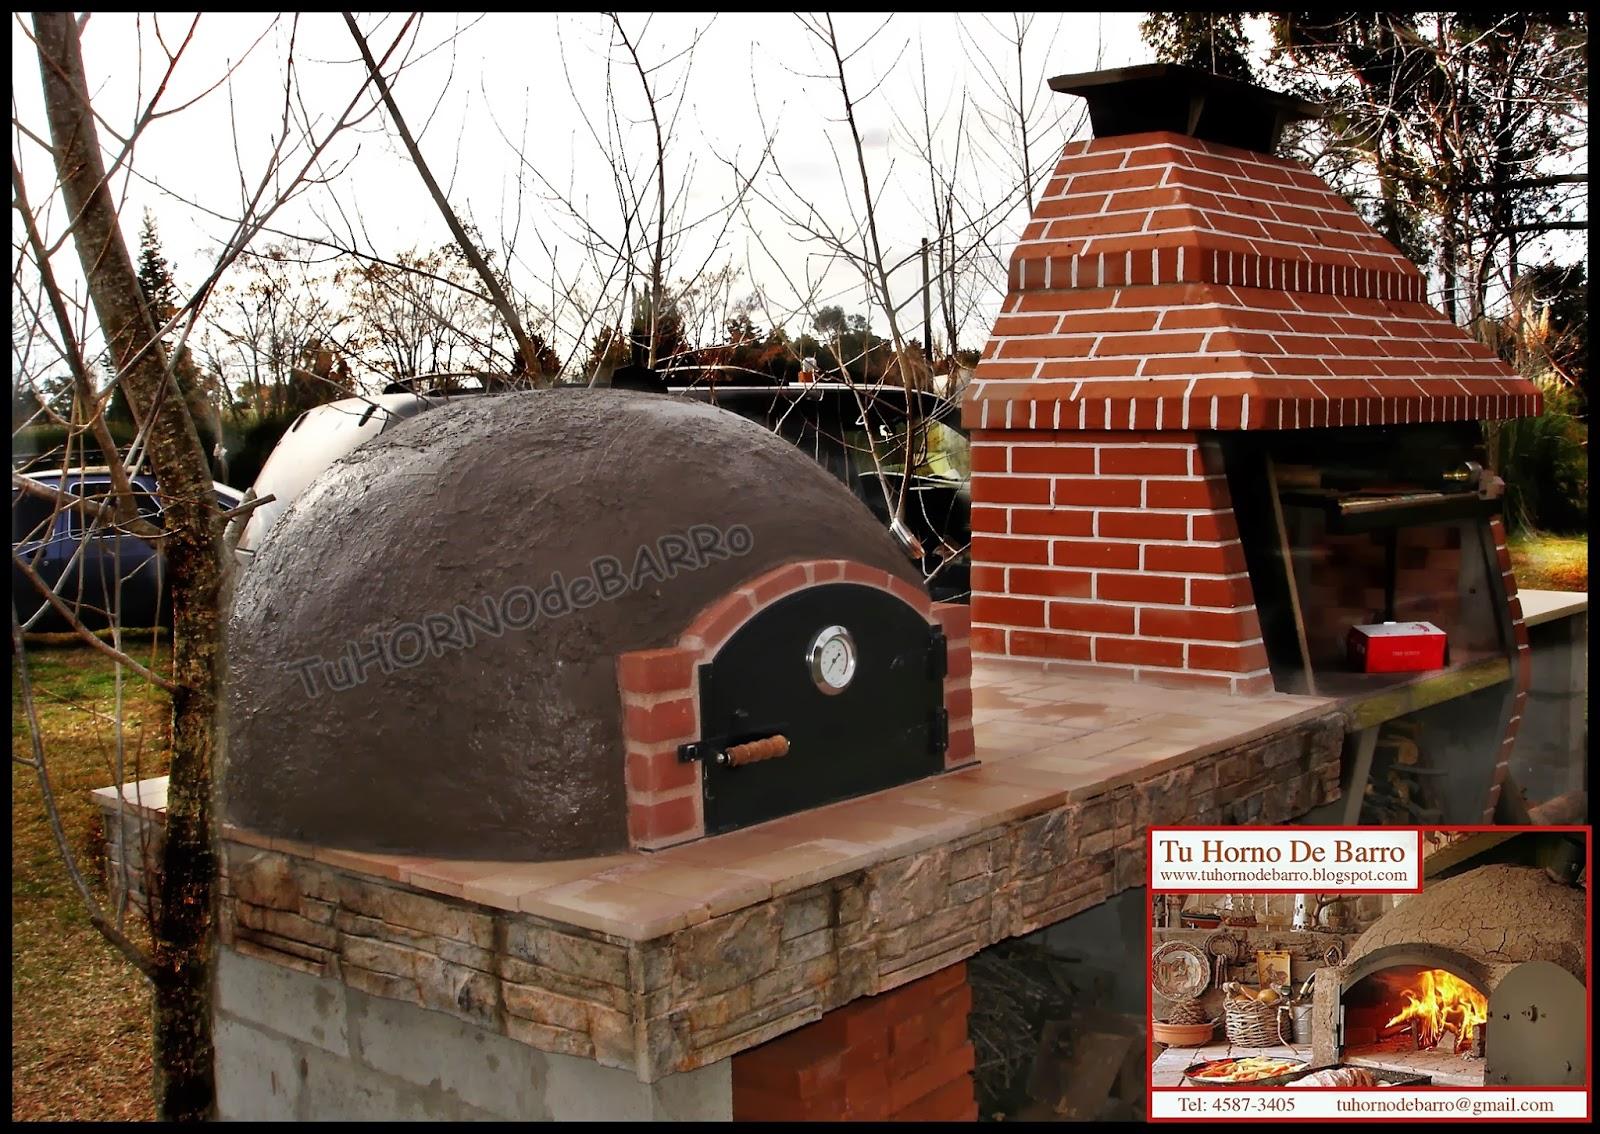 Tu horno de barro hornos de barro artesanales argentina buenos aires zona norte sur oeste - Hornos de barro ...